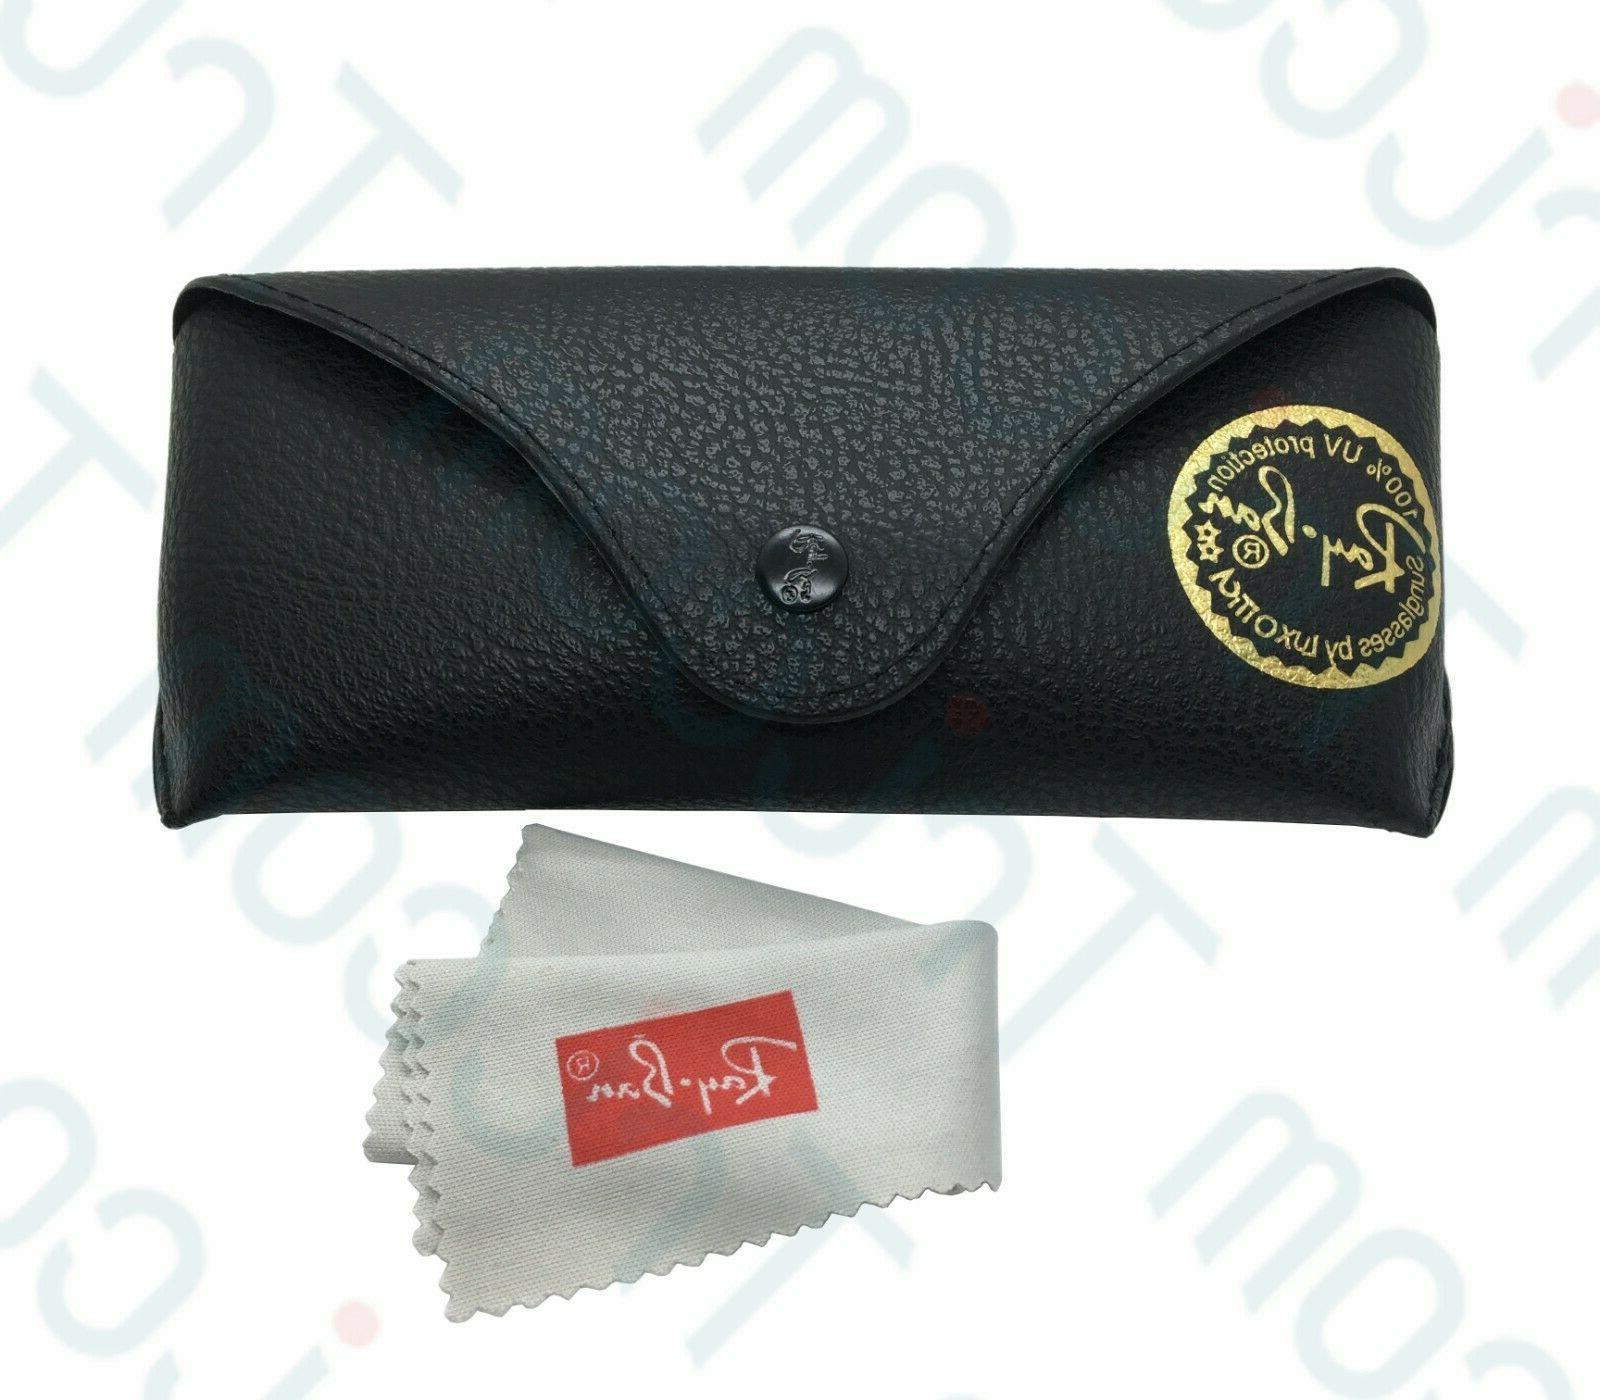 Ray-Ban Eyeglasses Soft Case Cloth